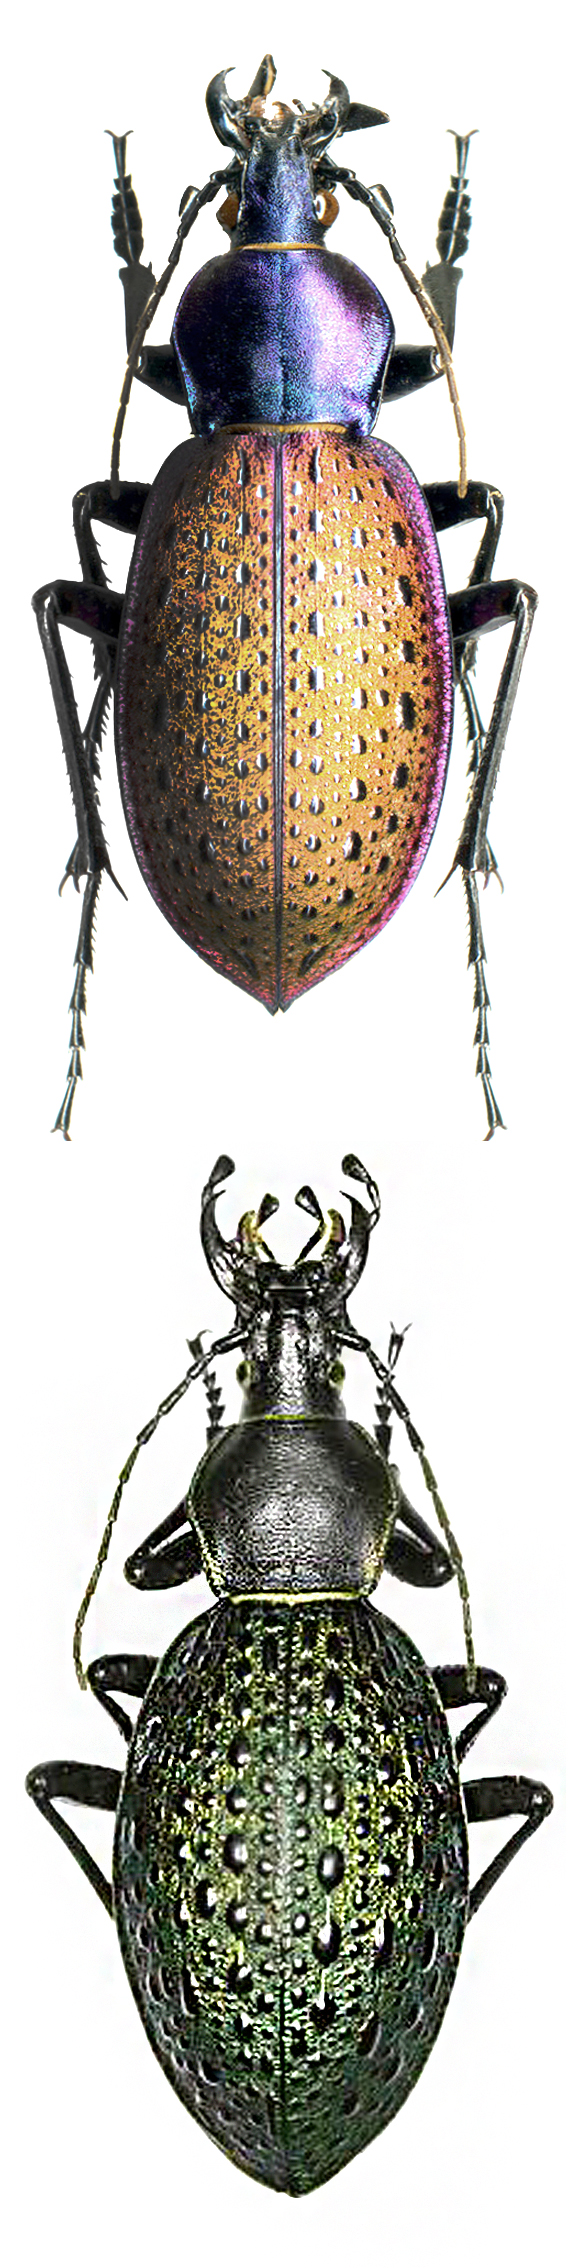 Coptolabrus formosus nilii, Coptolabrus formosus elytraviridis CARABIDAE